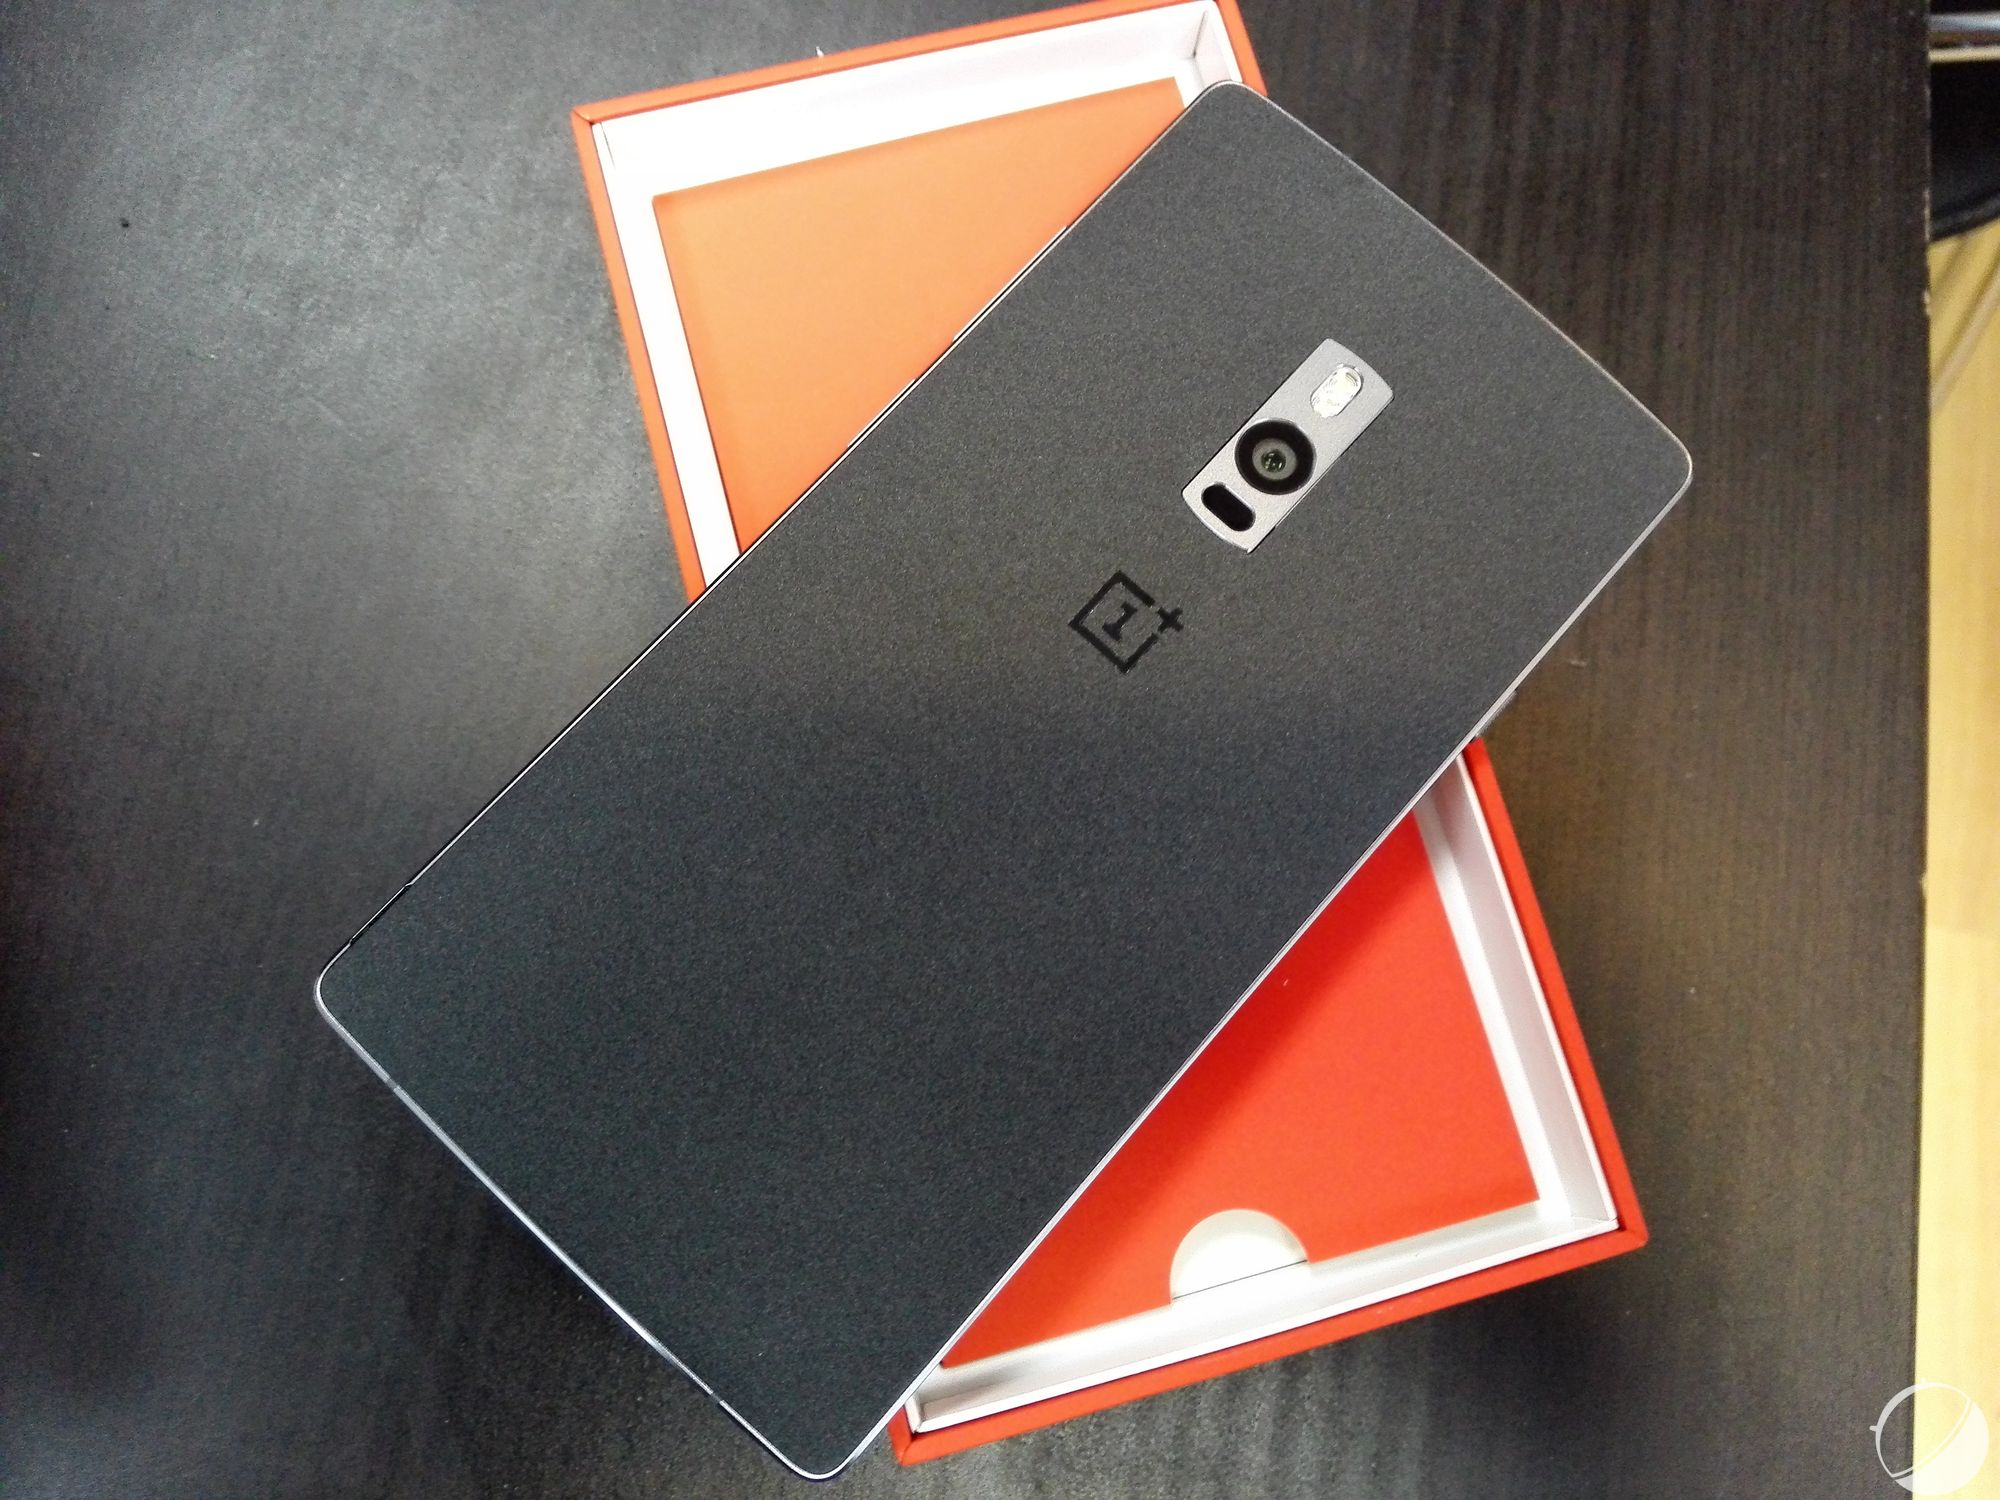 oneplus2 مراجعة OnePlus 2: مرة أخرى وان بلس تبهرني